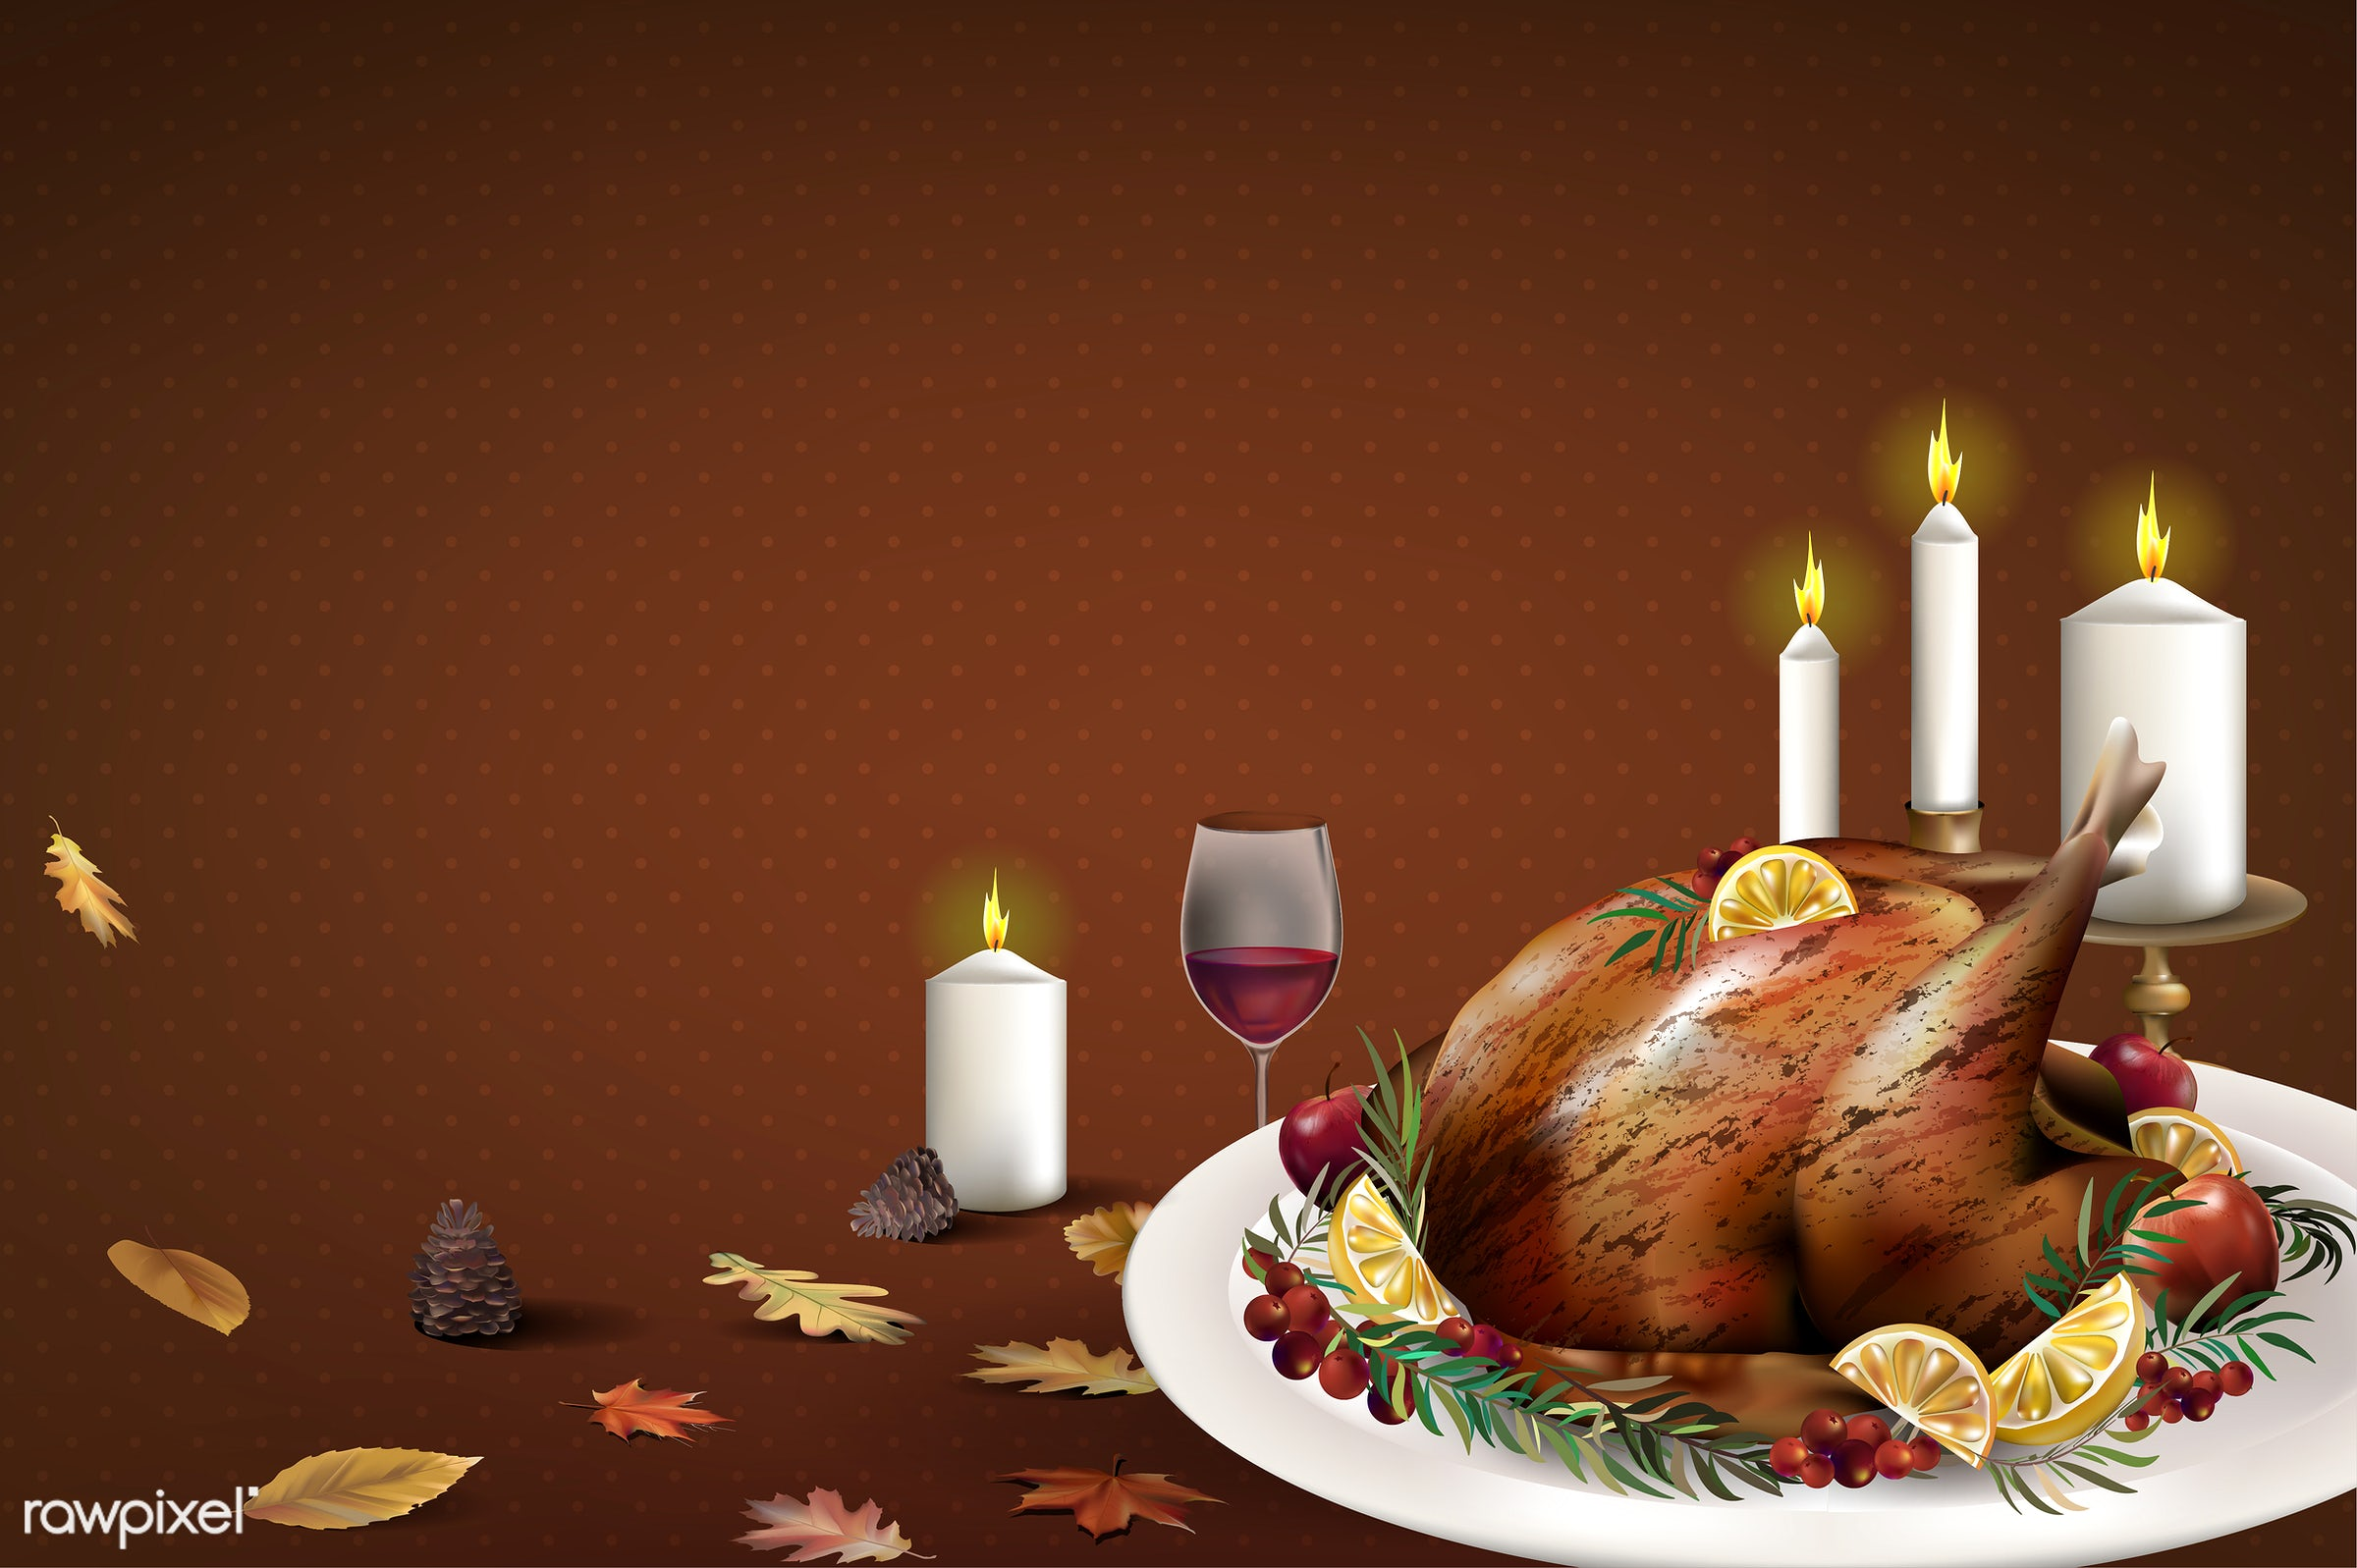 Illustration of wine glass isolated on white background - food, autumn, candles, celebration, decoration, dinner, elements,...